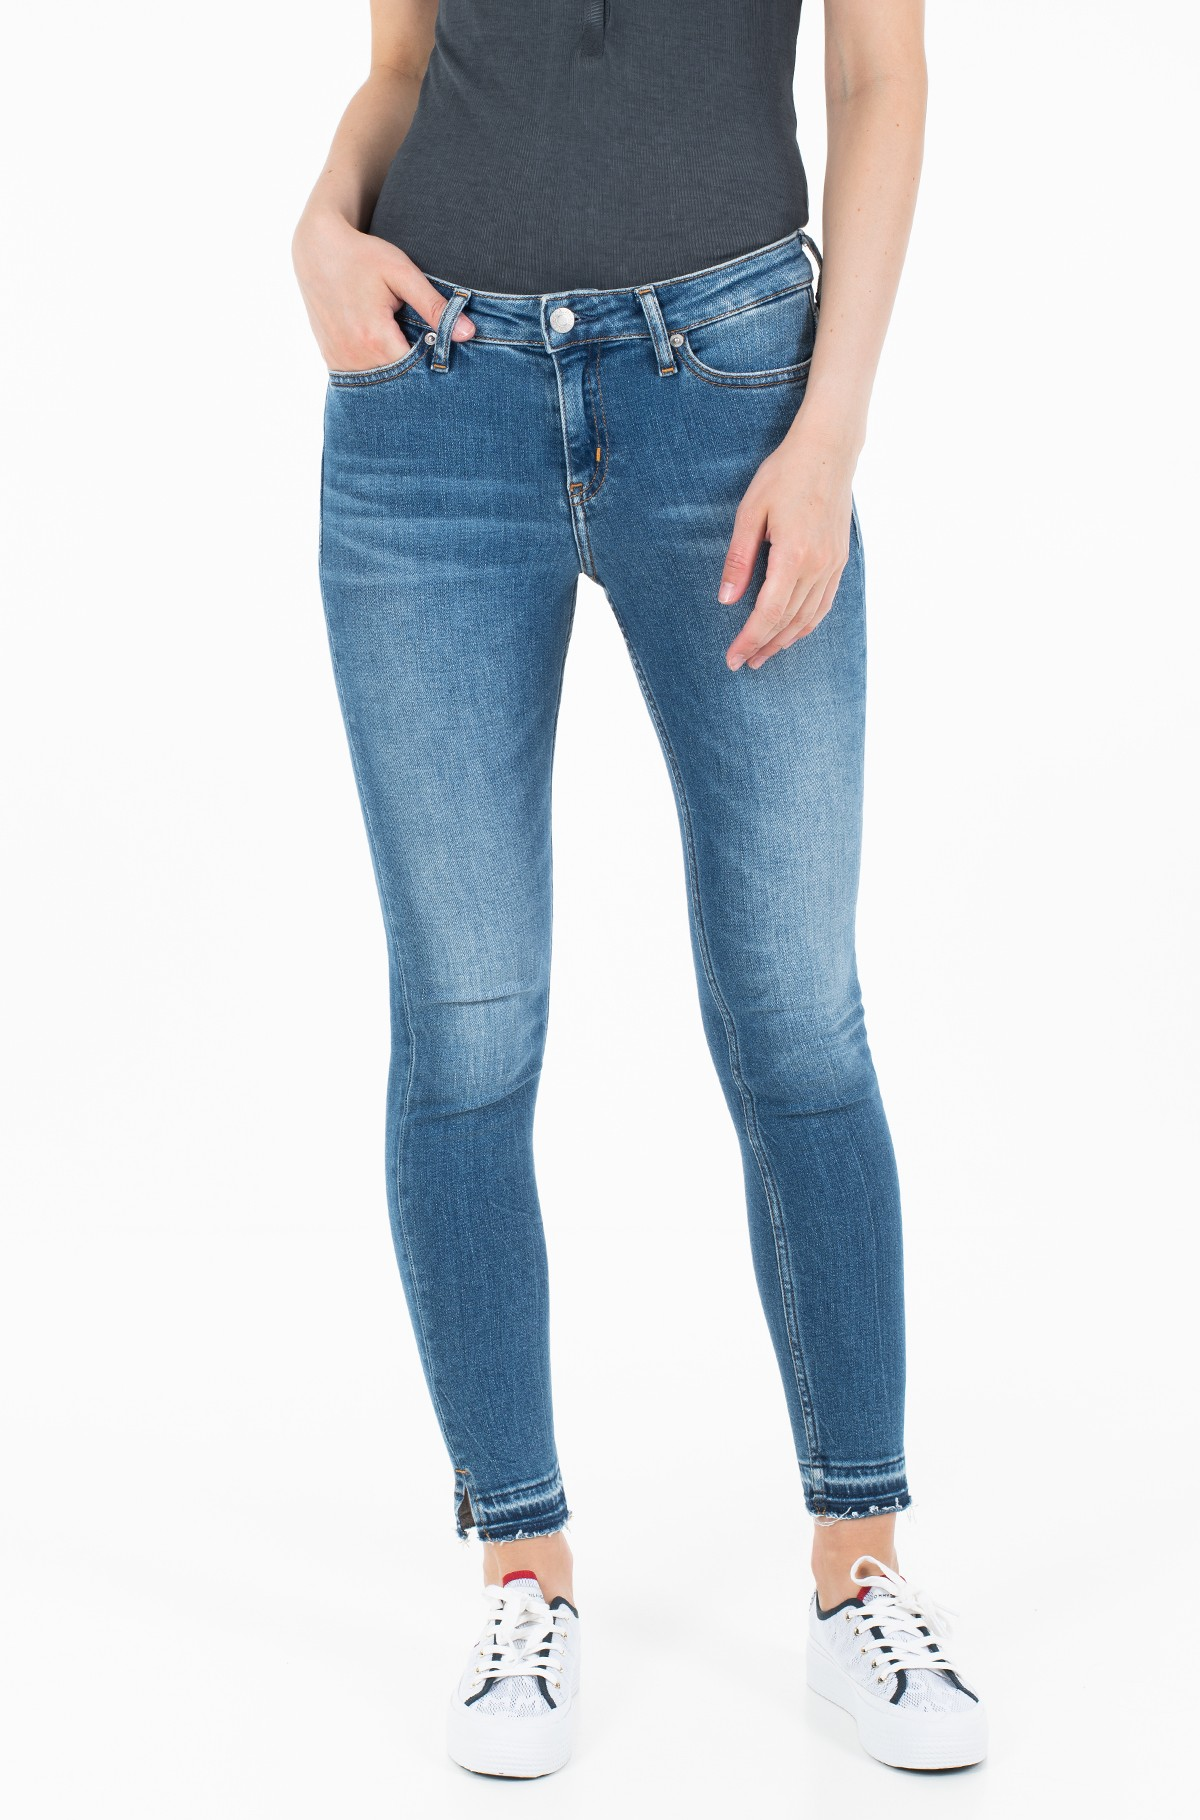 Jeans CKJ 001 SUPER SKINNY ANKLE J20J211434-full-1